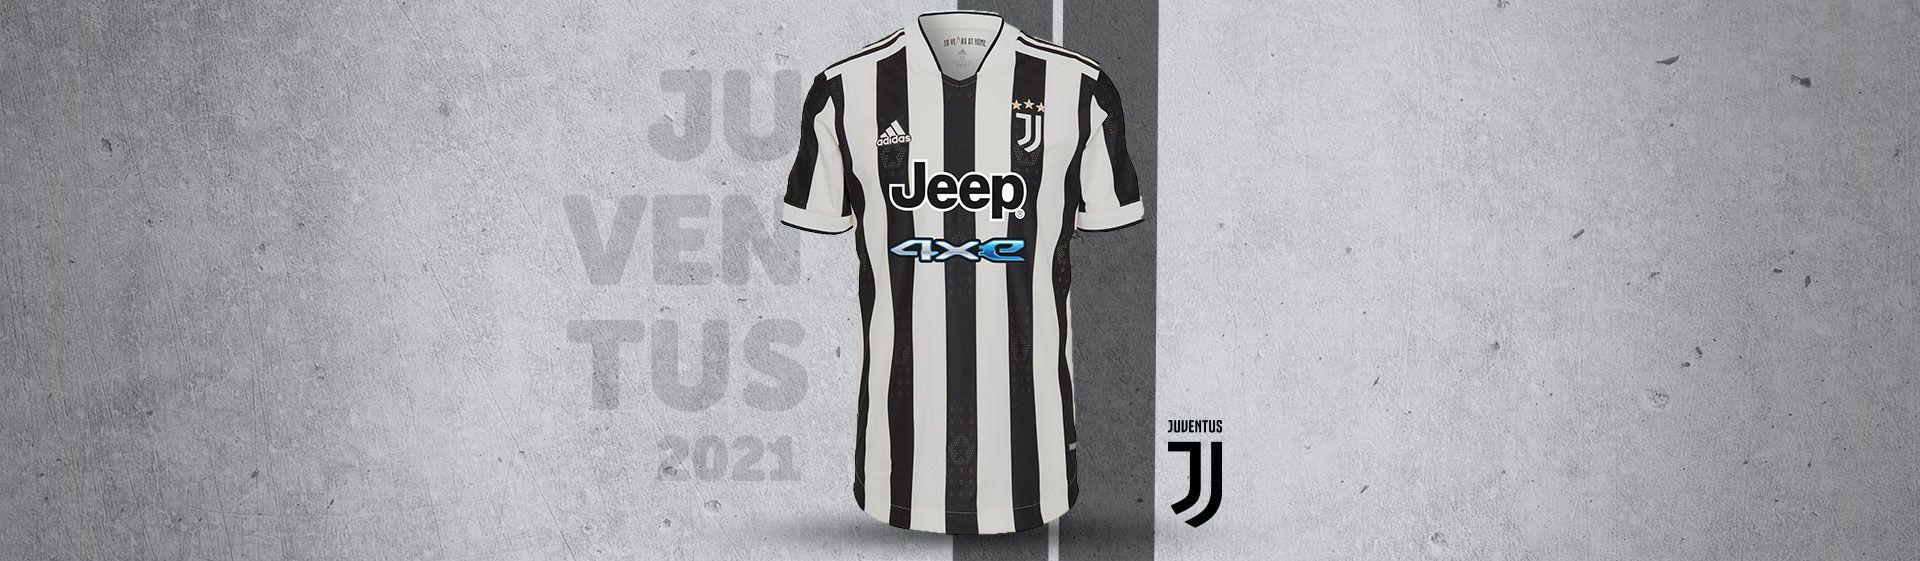 Camisa da Juventus: camisas da Juventus para comprar em 2021